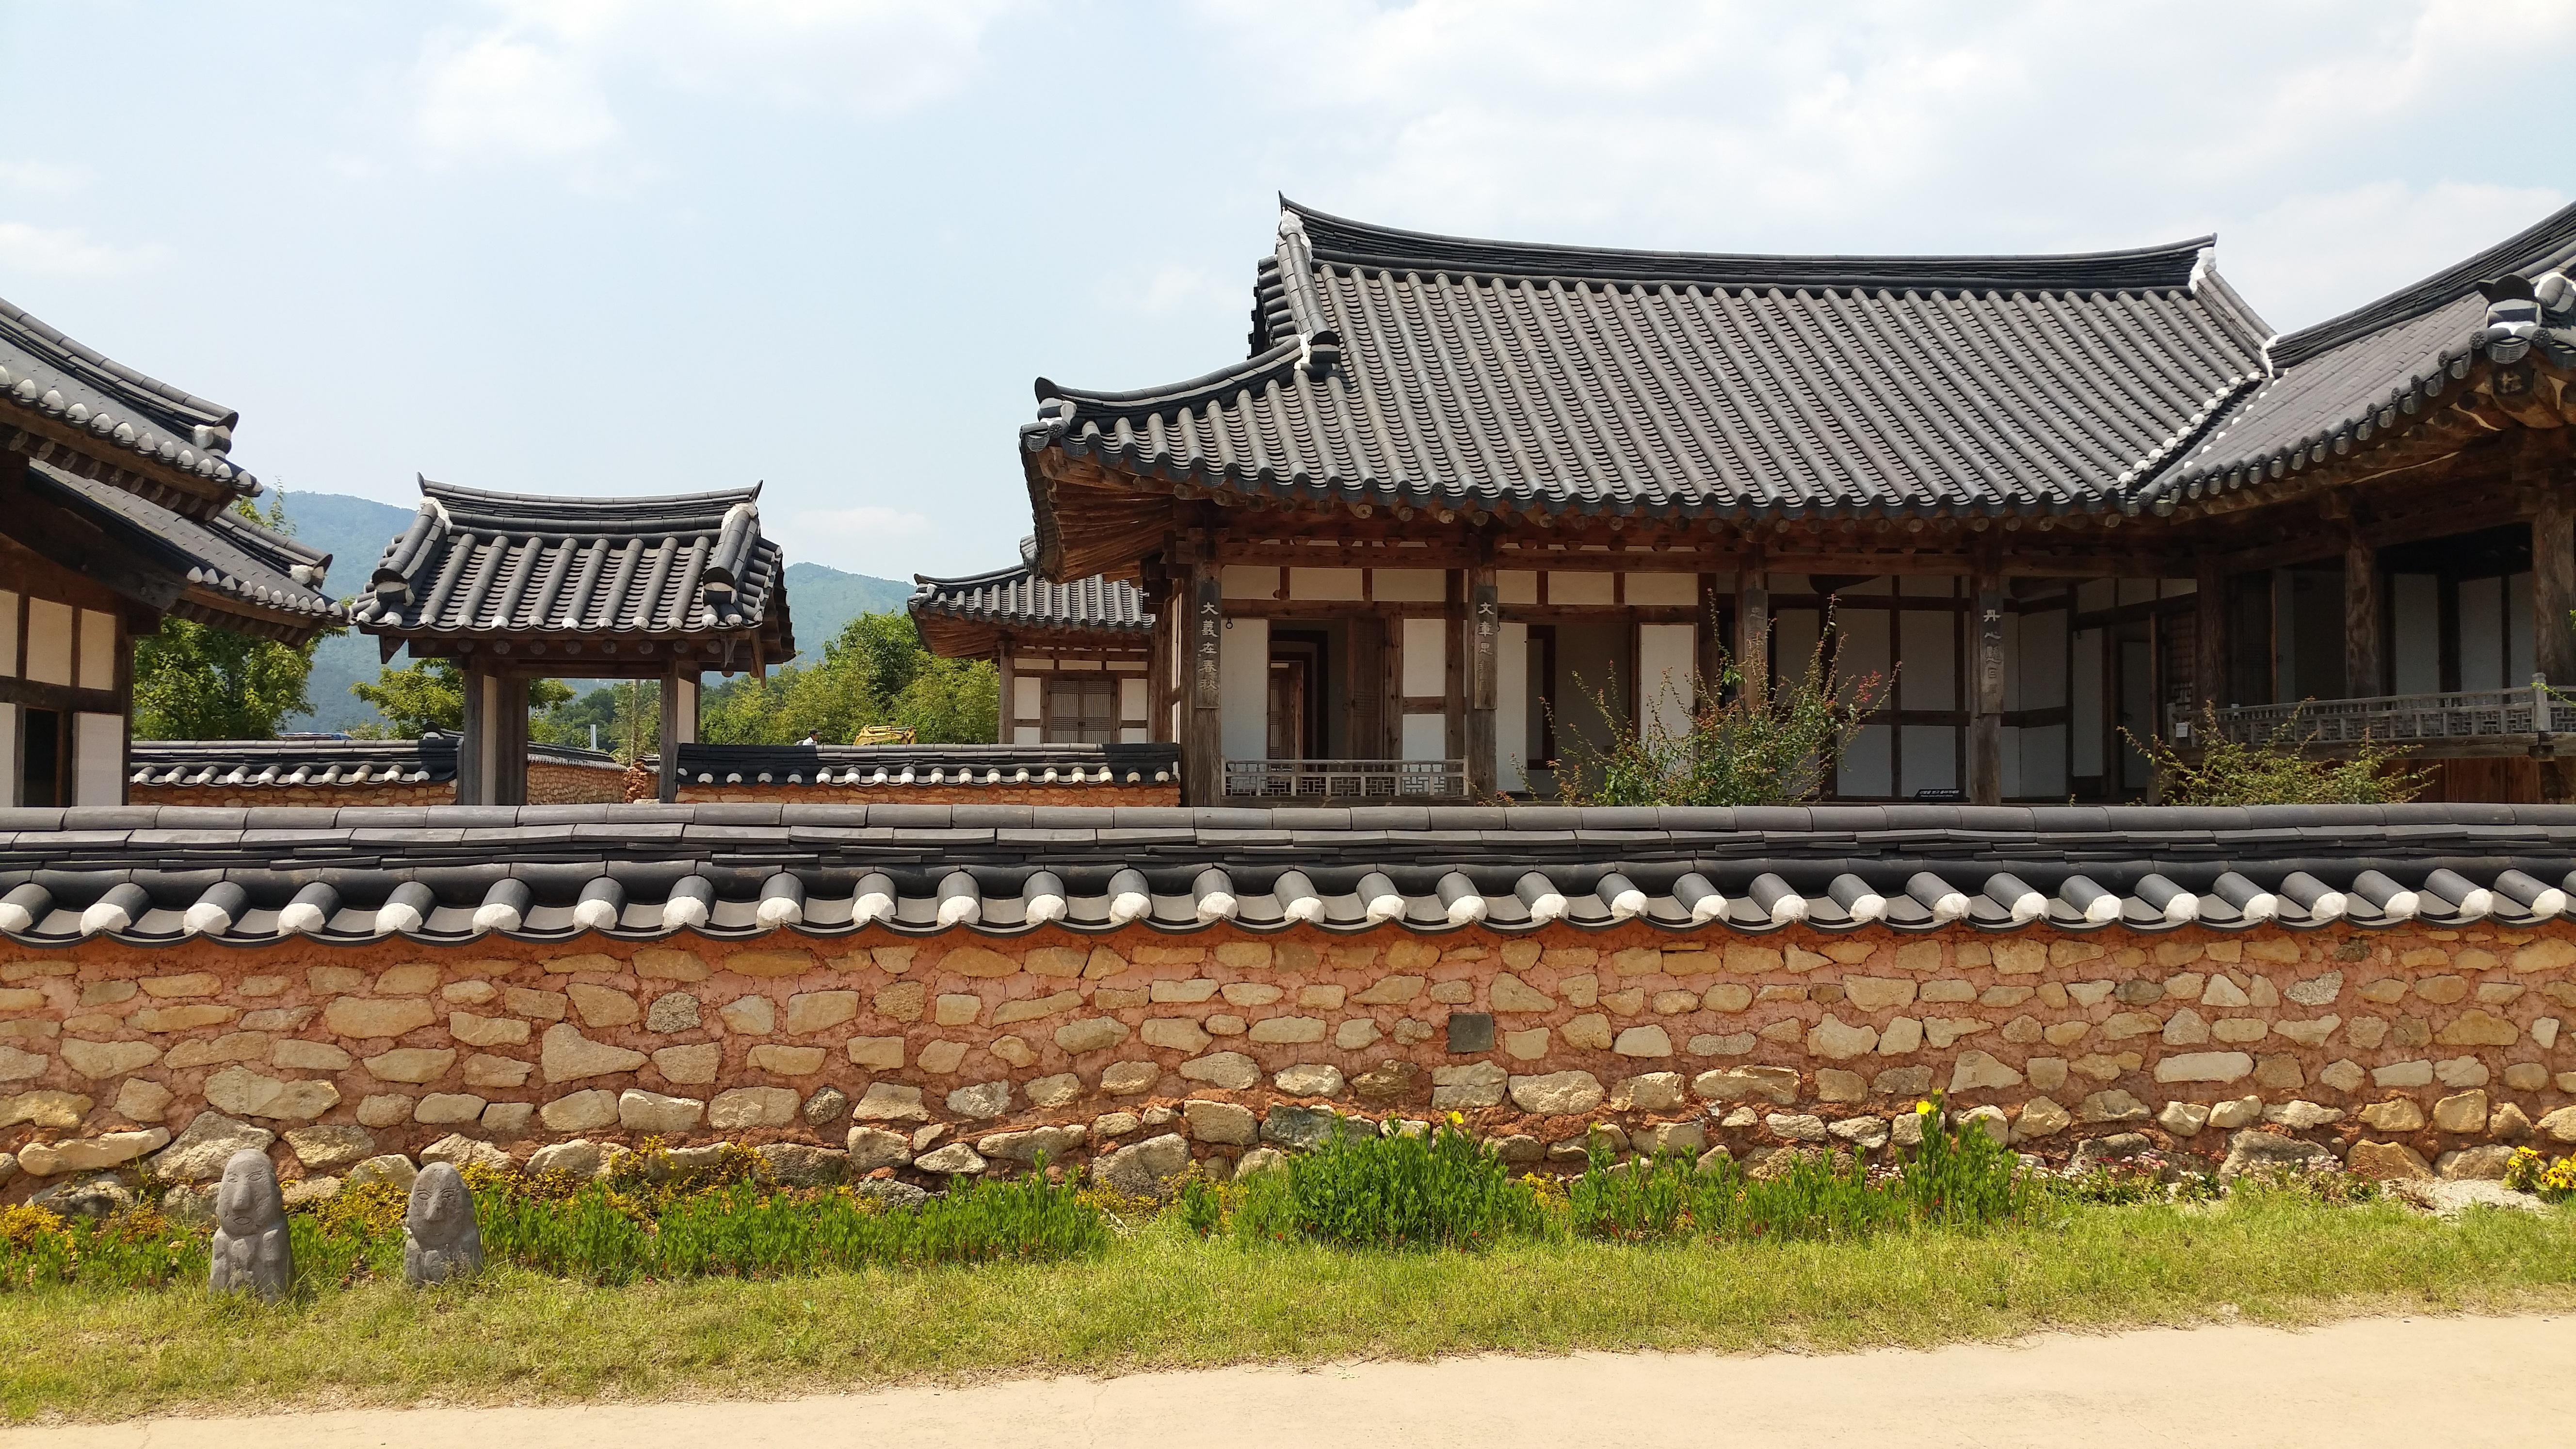 660 Gambar Pagar Rumah Cina Terbaik